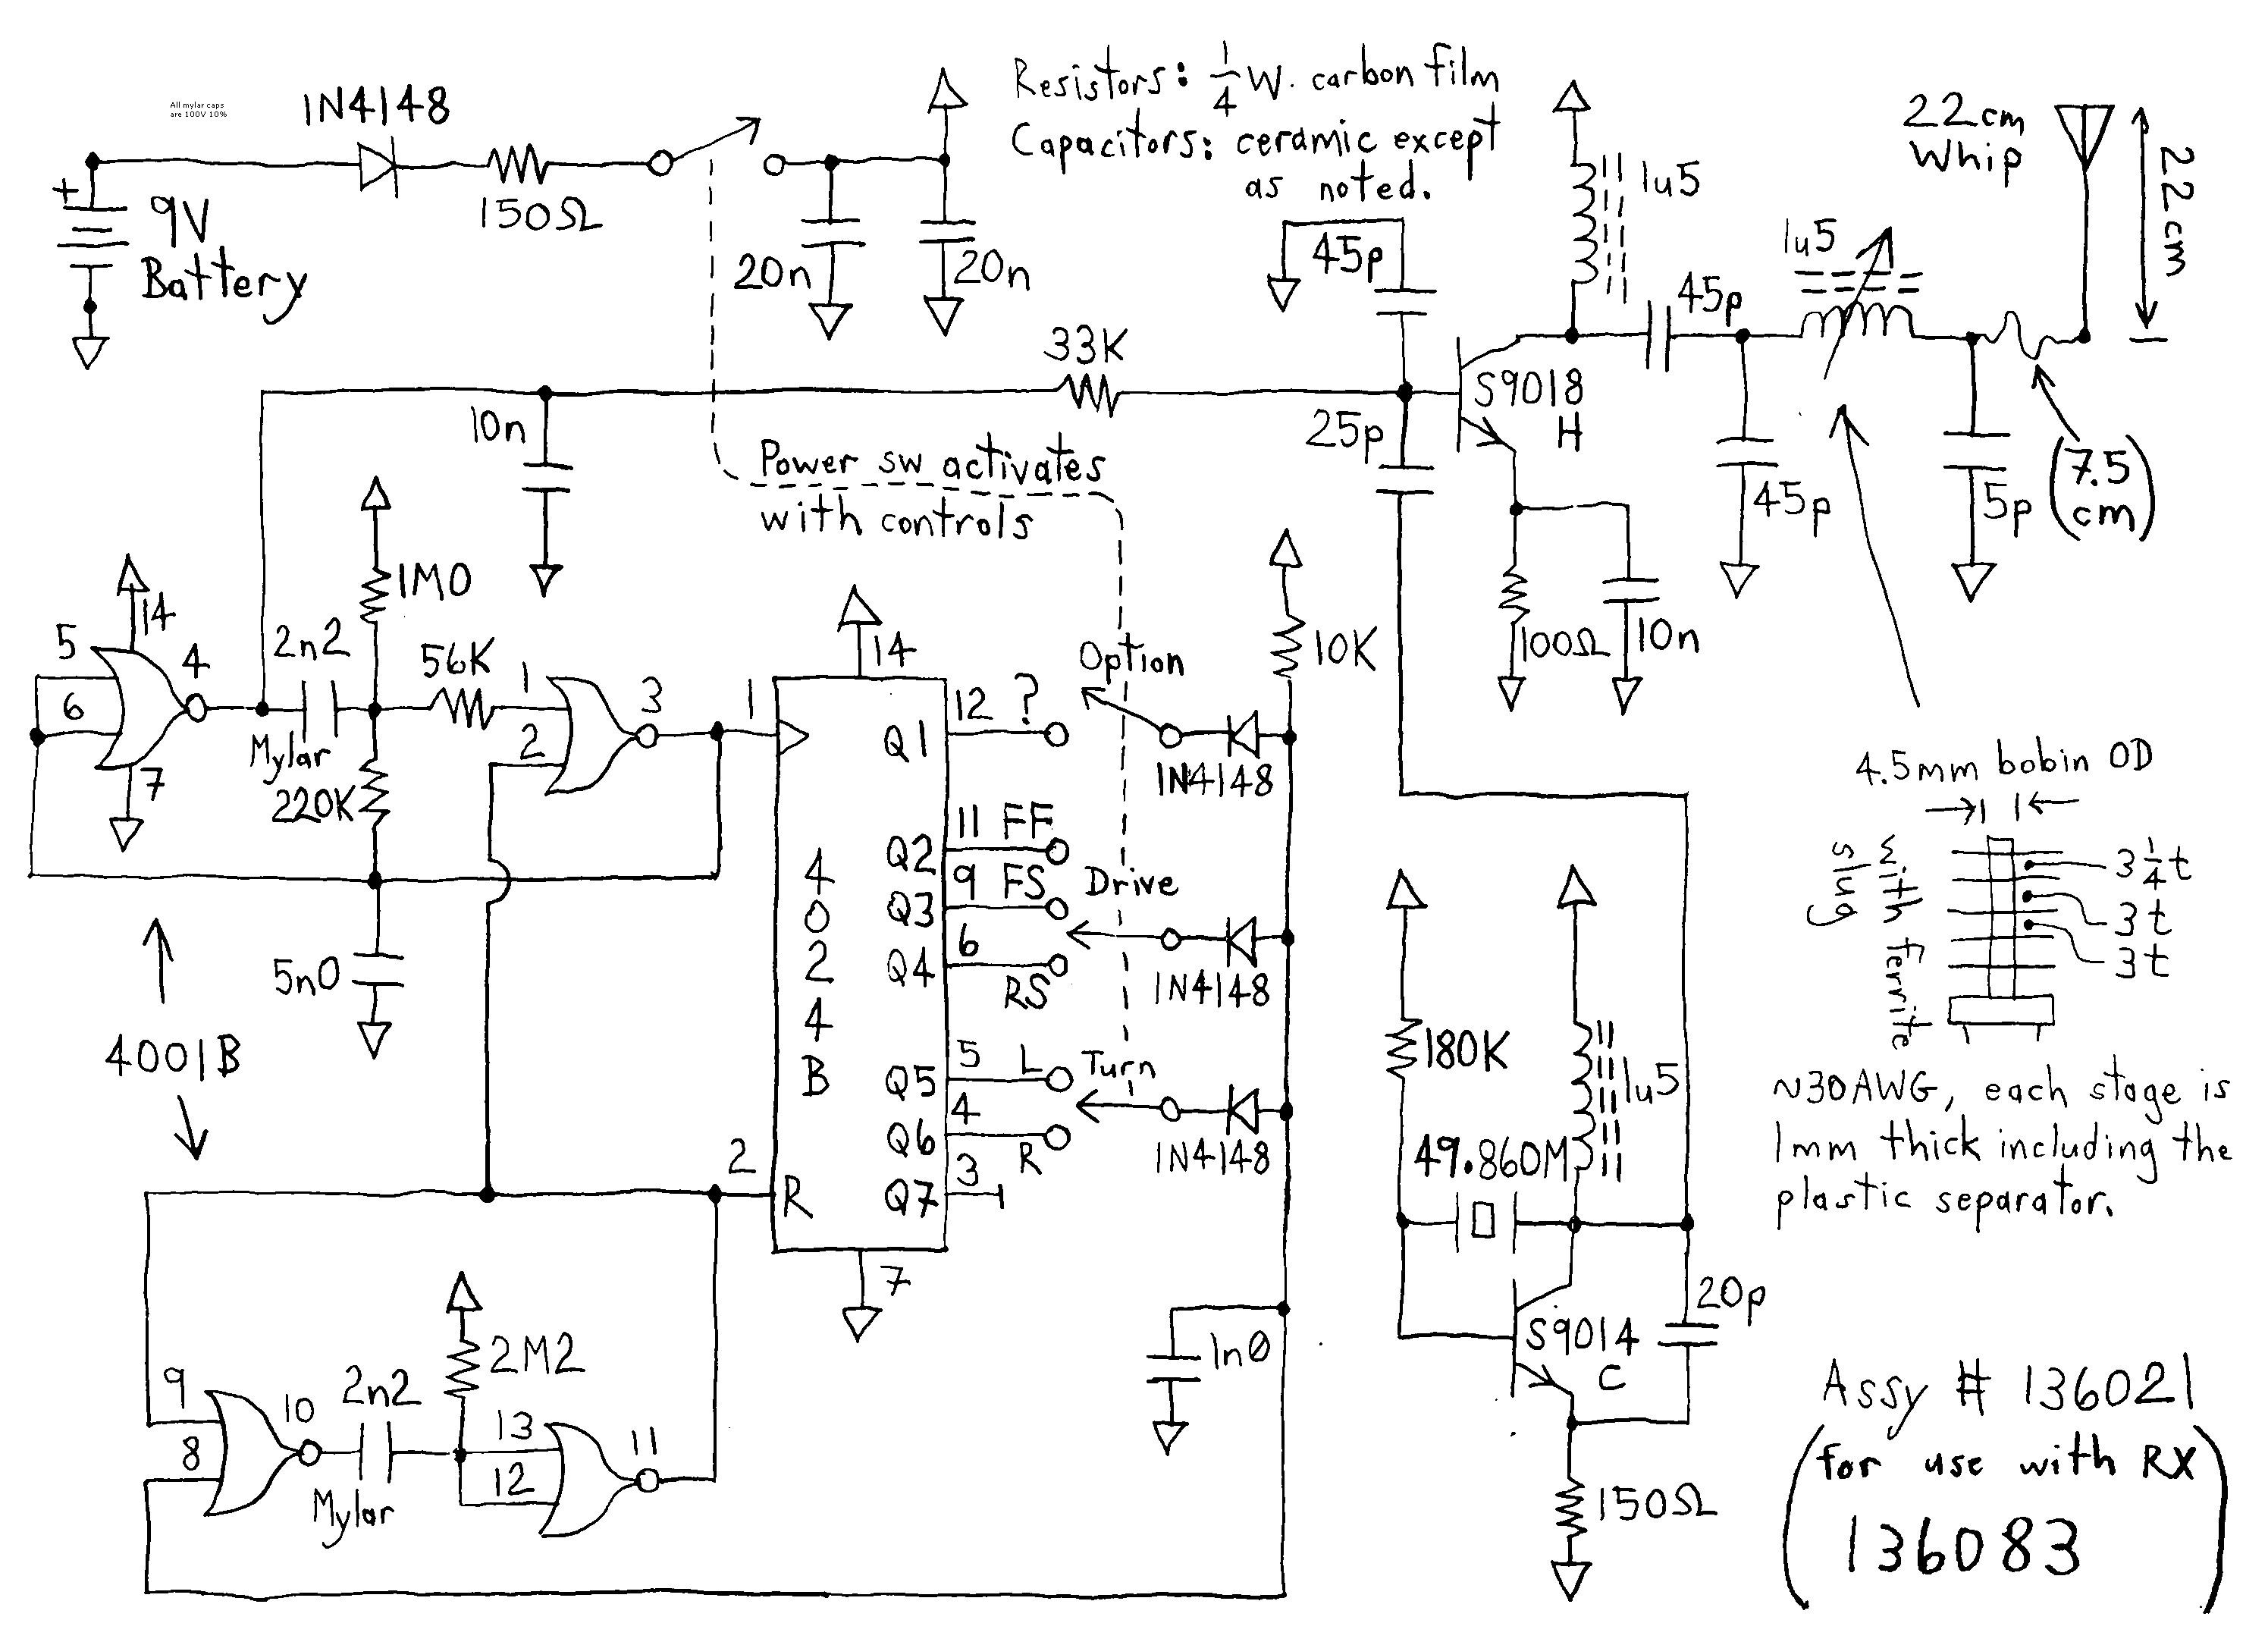 Circuit Diagram Of Remote Control Car Ponent Remote Control Car Circuit Diagram Make A Electronic Of Circuit Diagram Of Remote Control Car